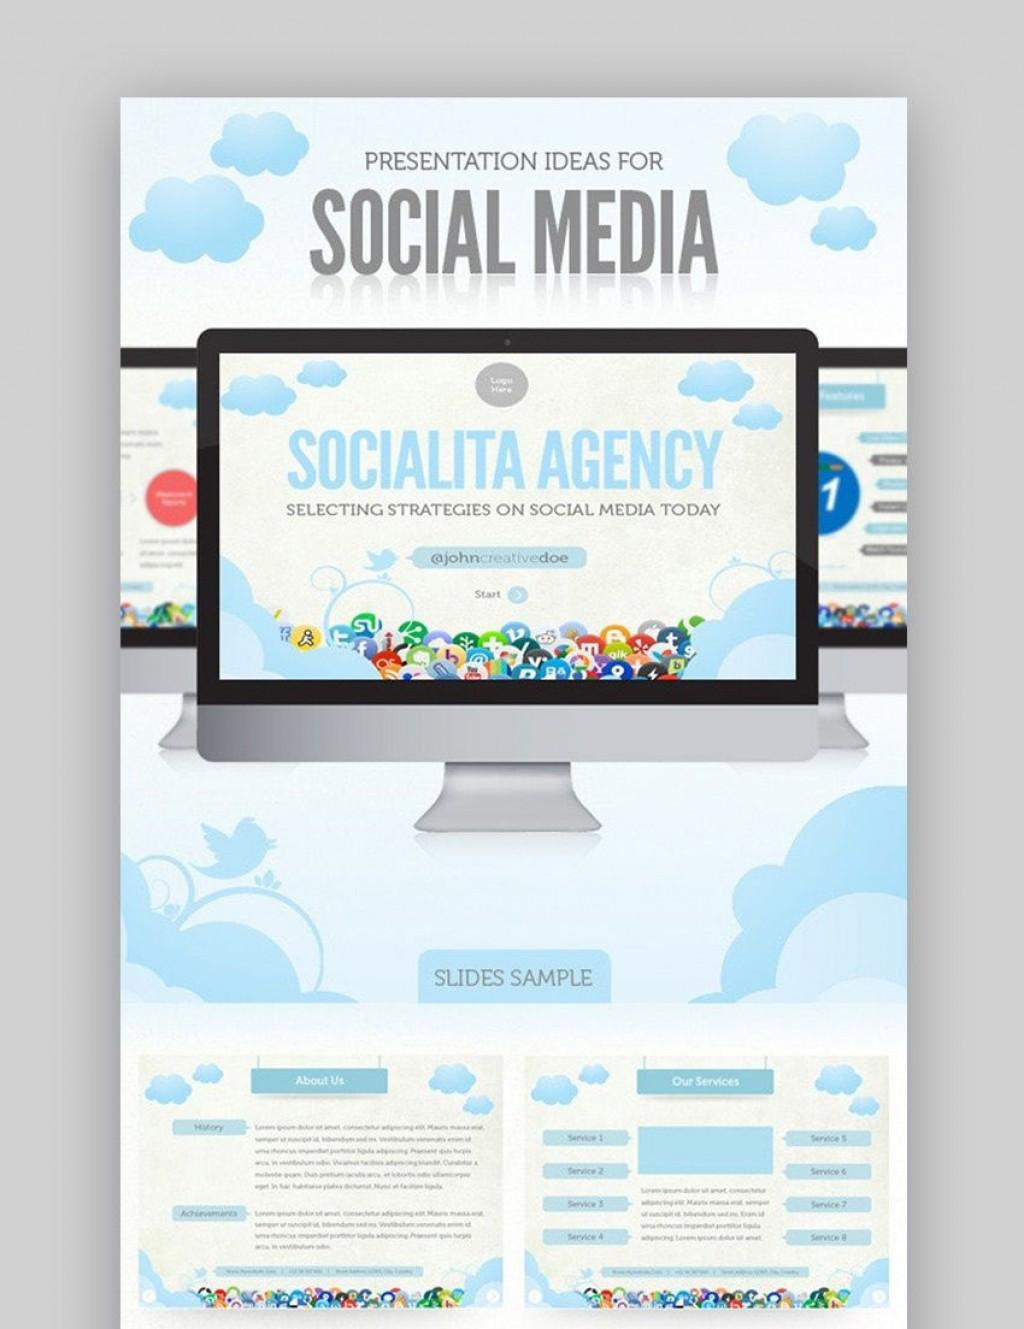 007 Marvelou Social Media Proposal Template Ppt High Definition Large